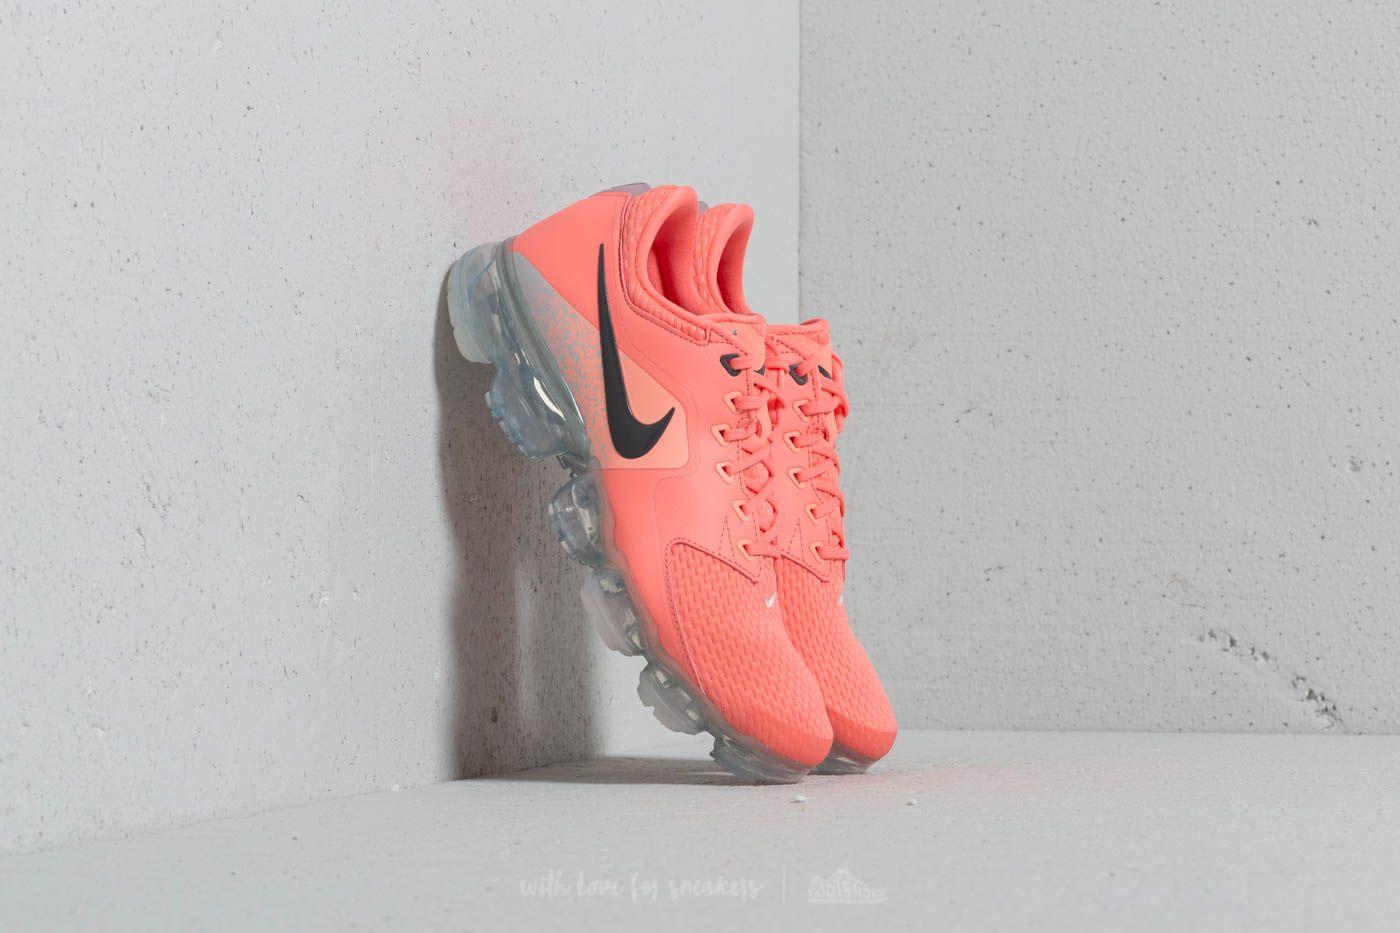 af880b784ce286 Nike Air Vapormax Wmns Light Atomic  Dark Grey at a great price £165 buy